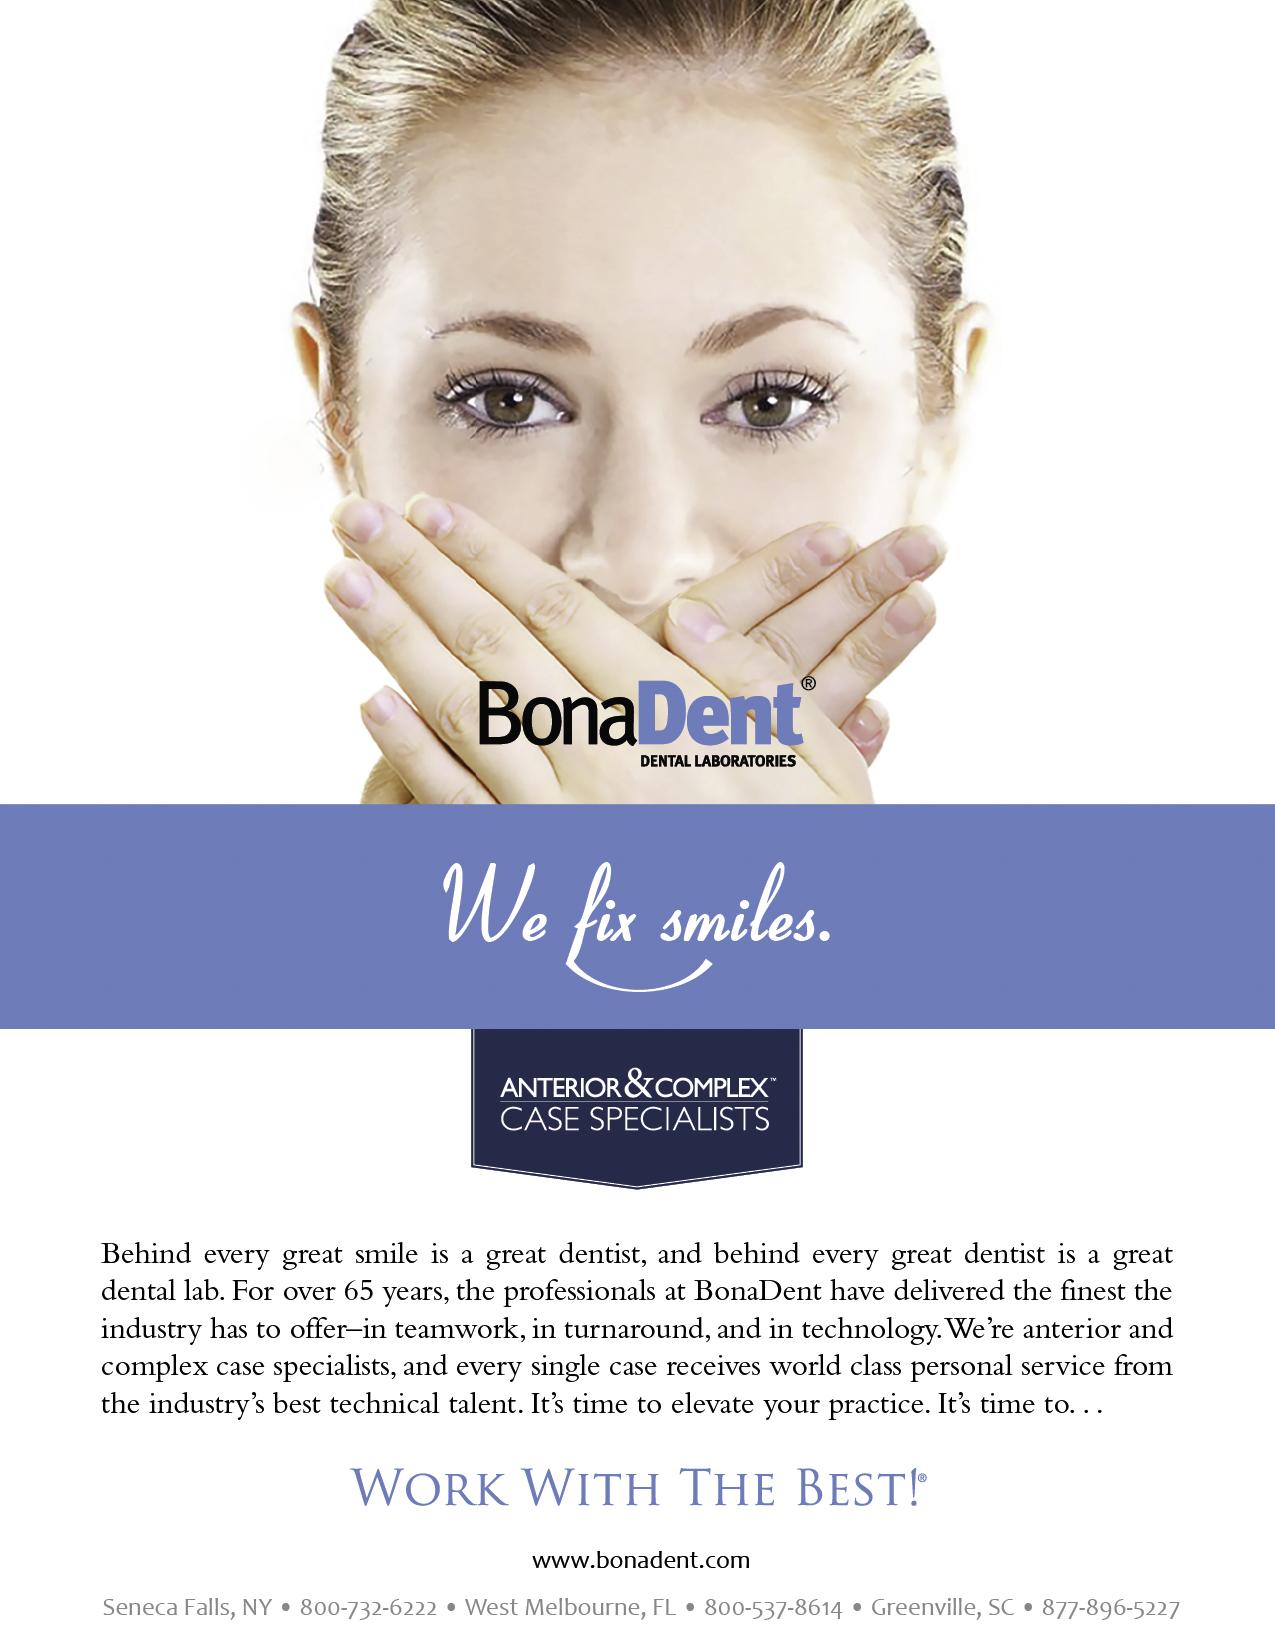 Bona Dent 1.jpg